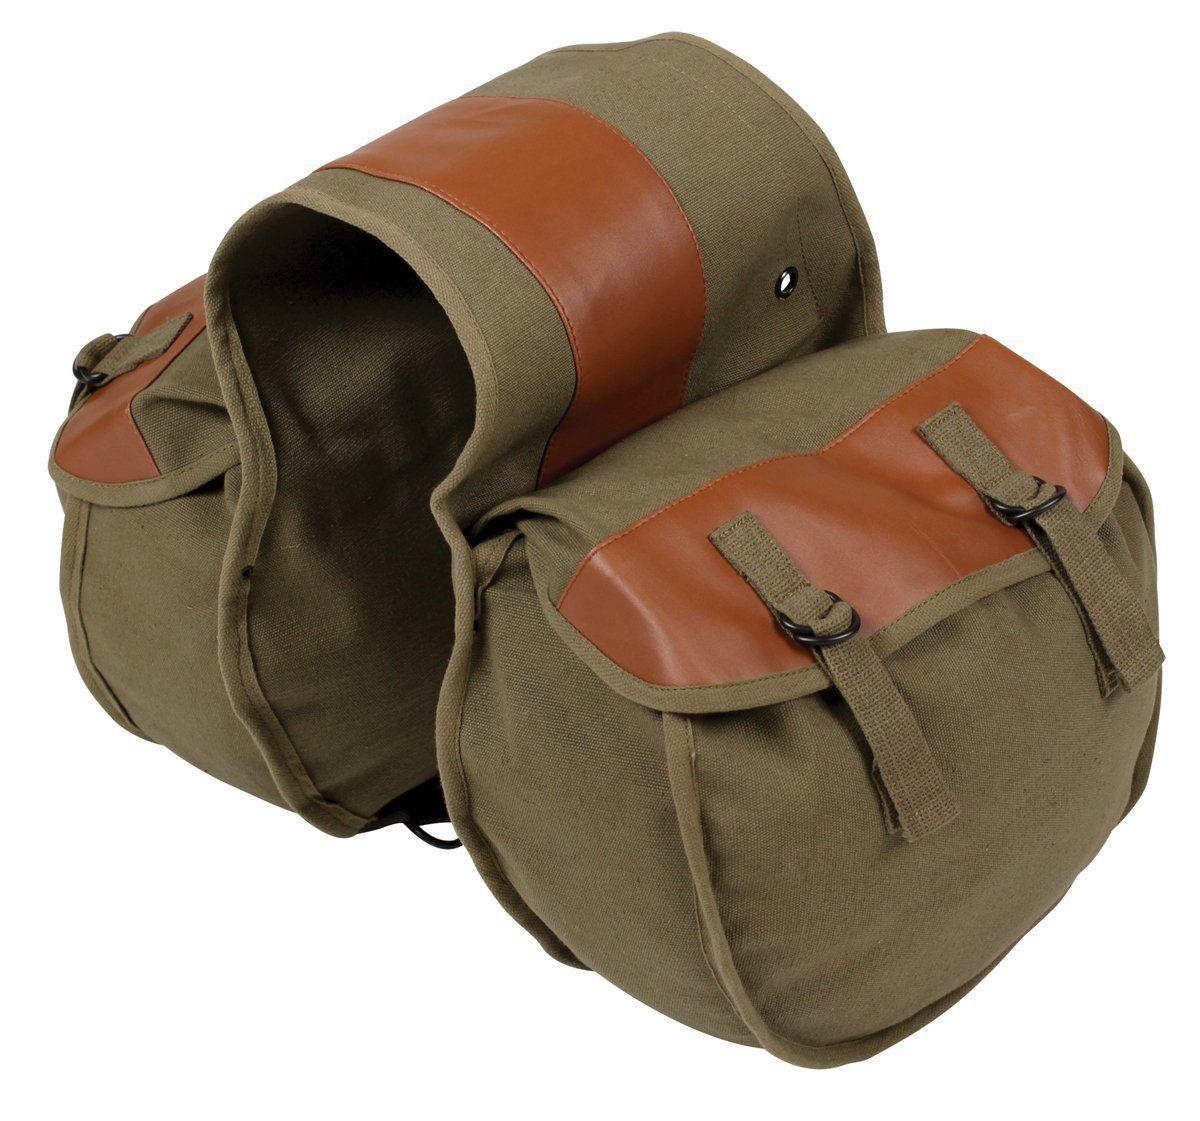 Amazon Com Stansport Saddle Bag Bycicle Saddle Bags Sports Outdoors Bike Saddle Bags Pannier Bag Saddle Bags